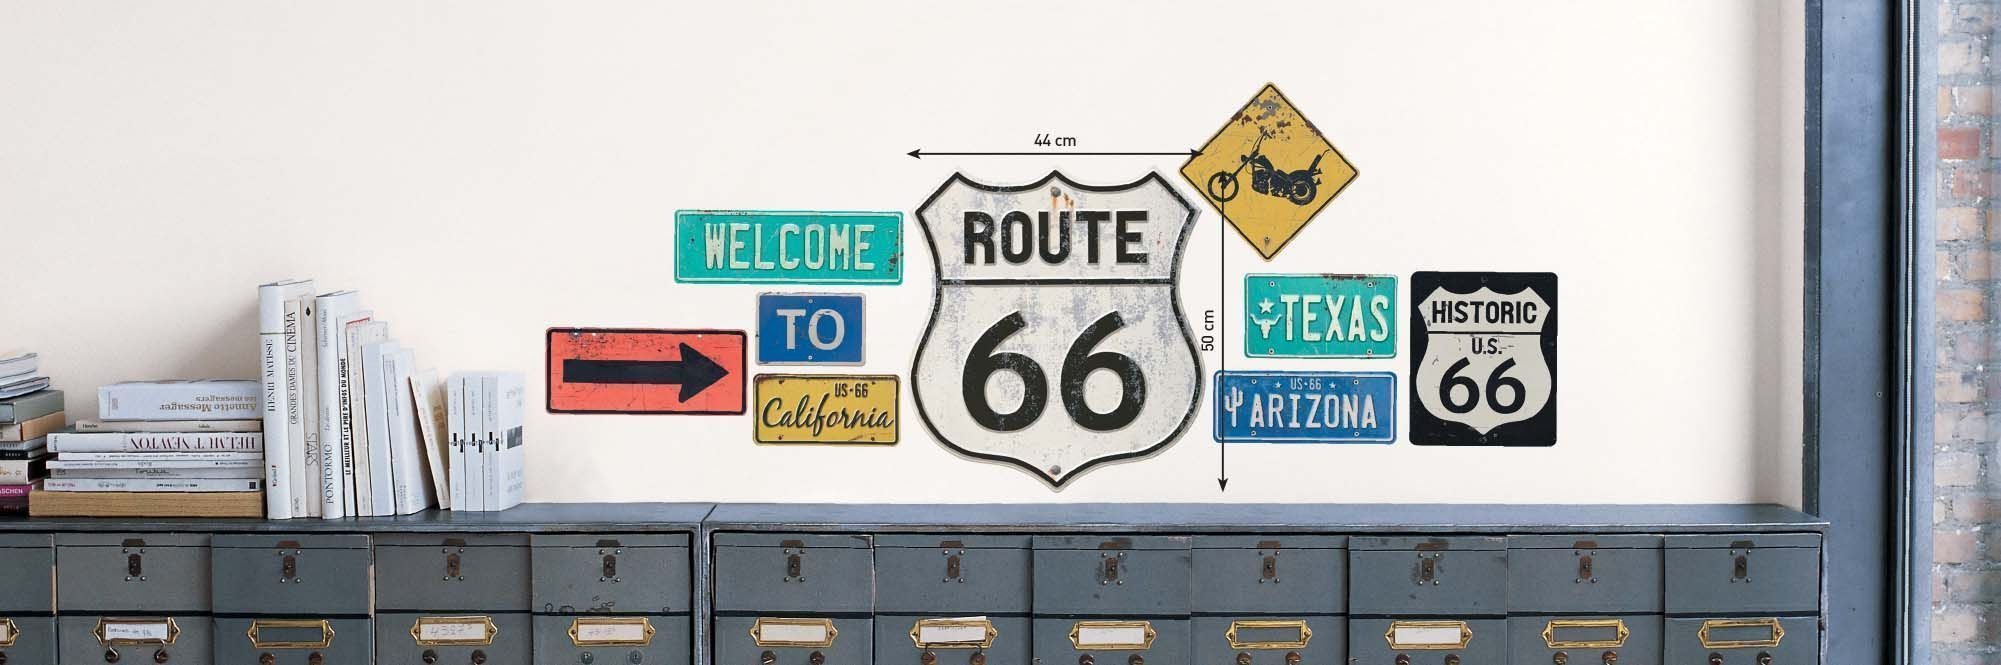 Sticker mural route 66 panneau for Route 66 mural